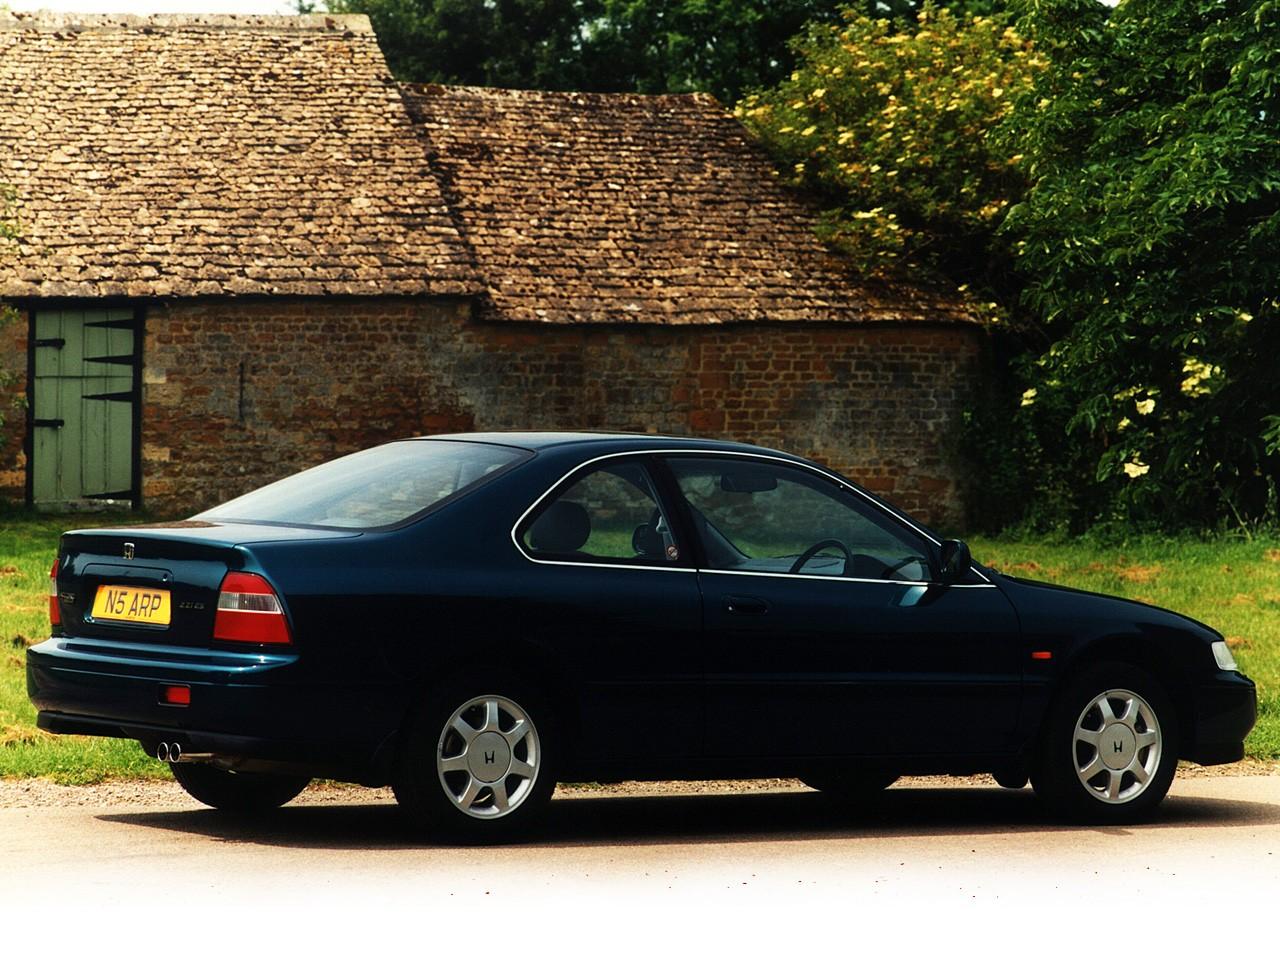 accord honda coupe 1994 cd7 1998 spec 1995 1996 autoevolution 1997 cars 1024